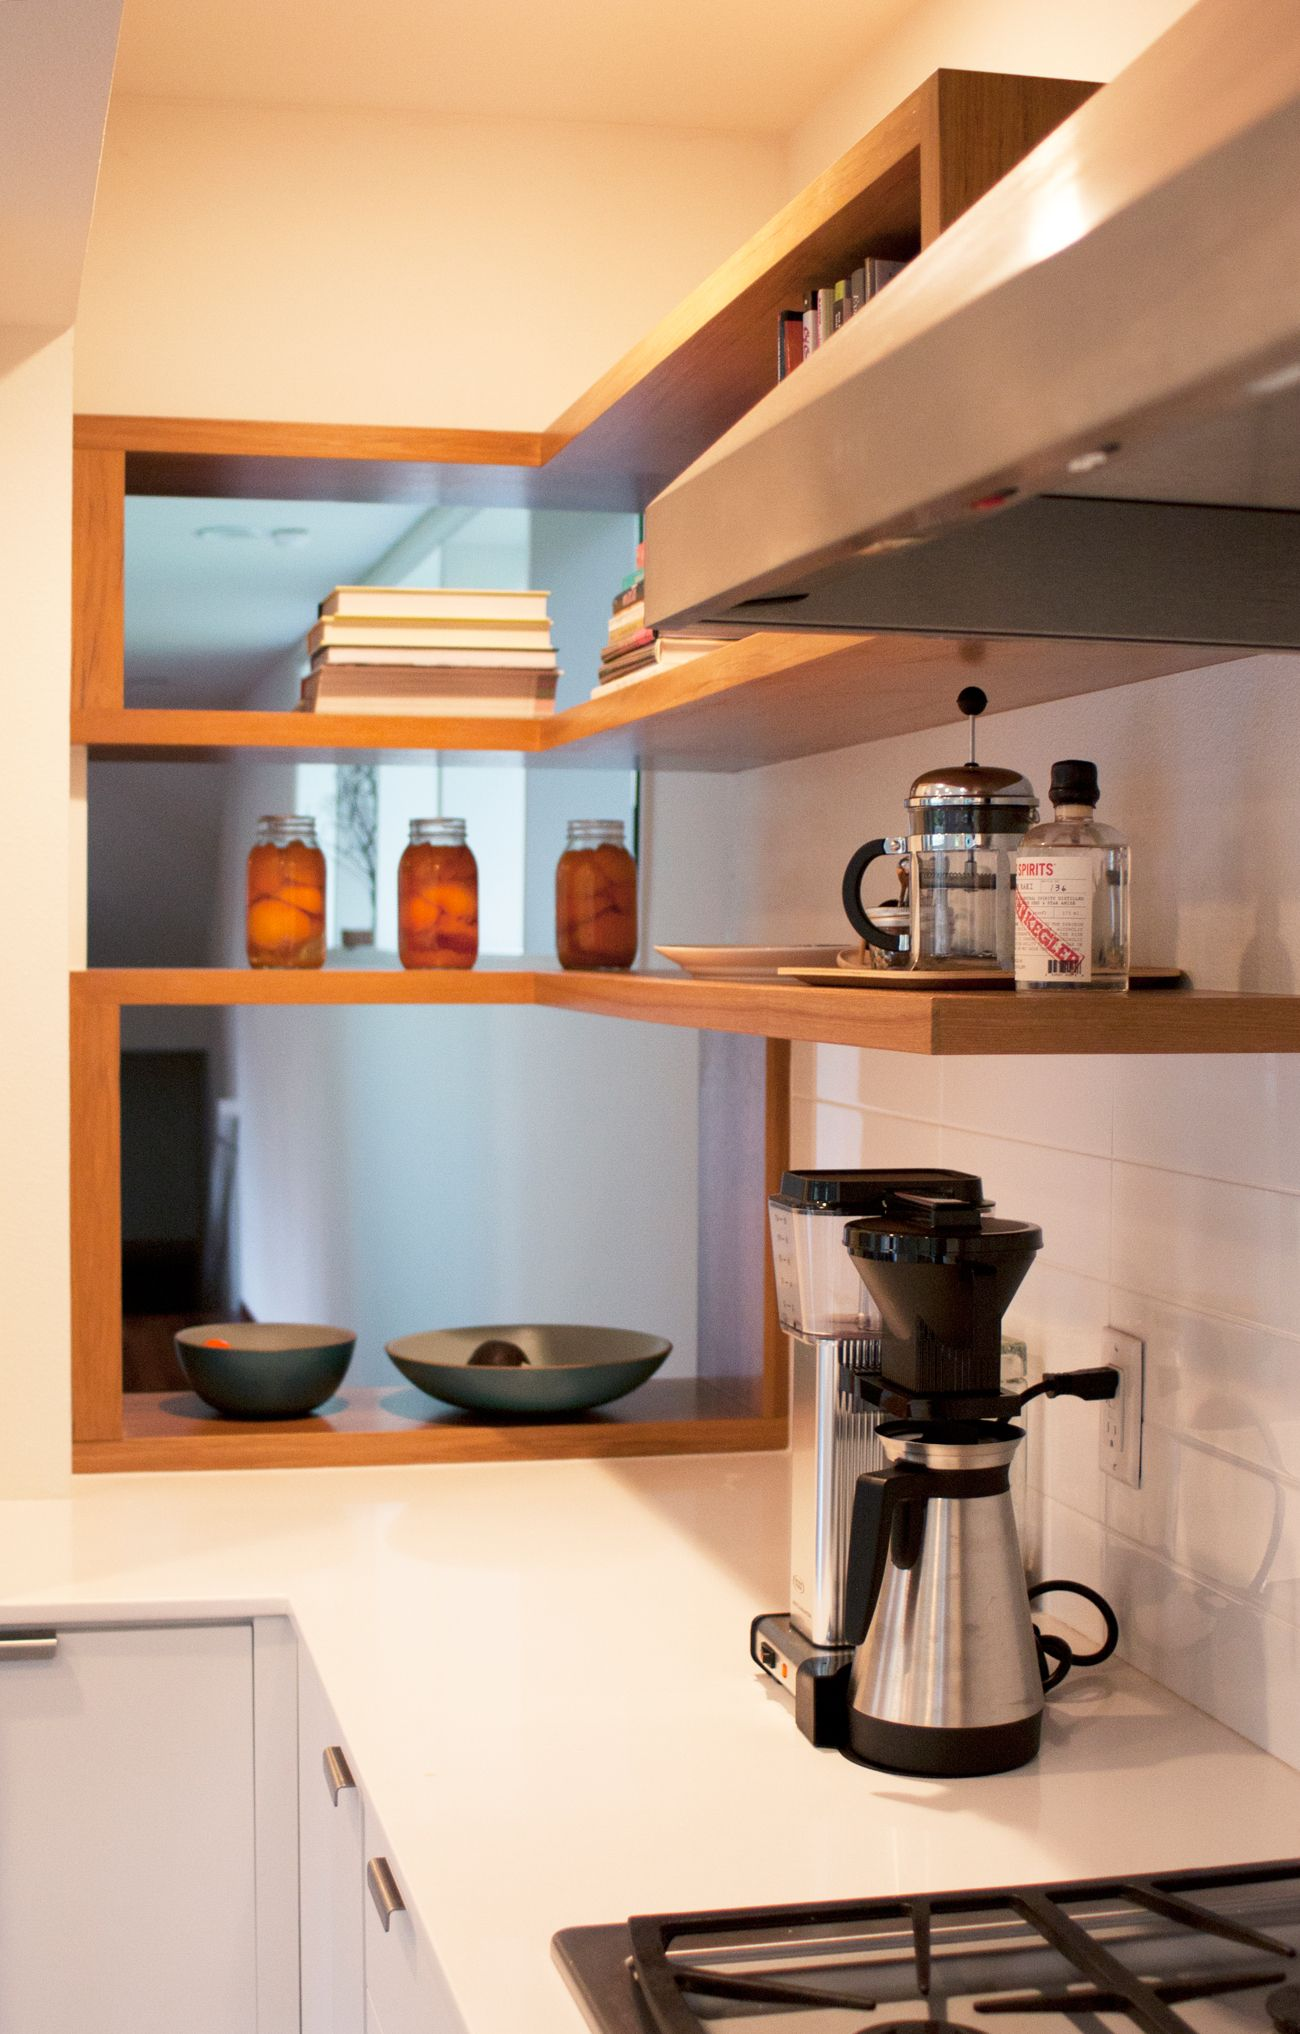 Modern kitchen shelves - Open Shelves In Modern Kitchen Designed By Bright Designlab And Built By Hammer Hand